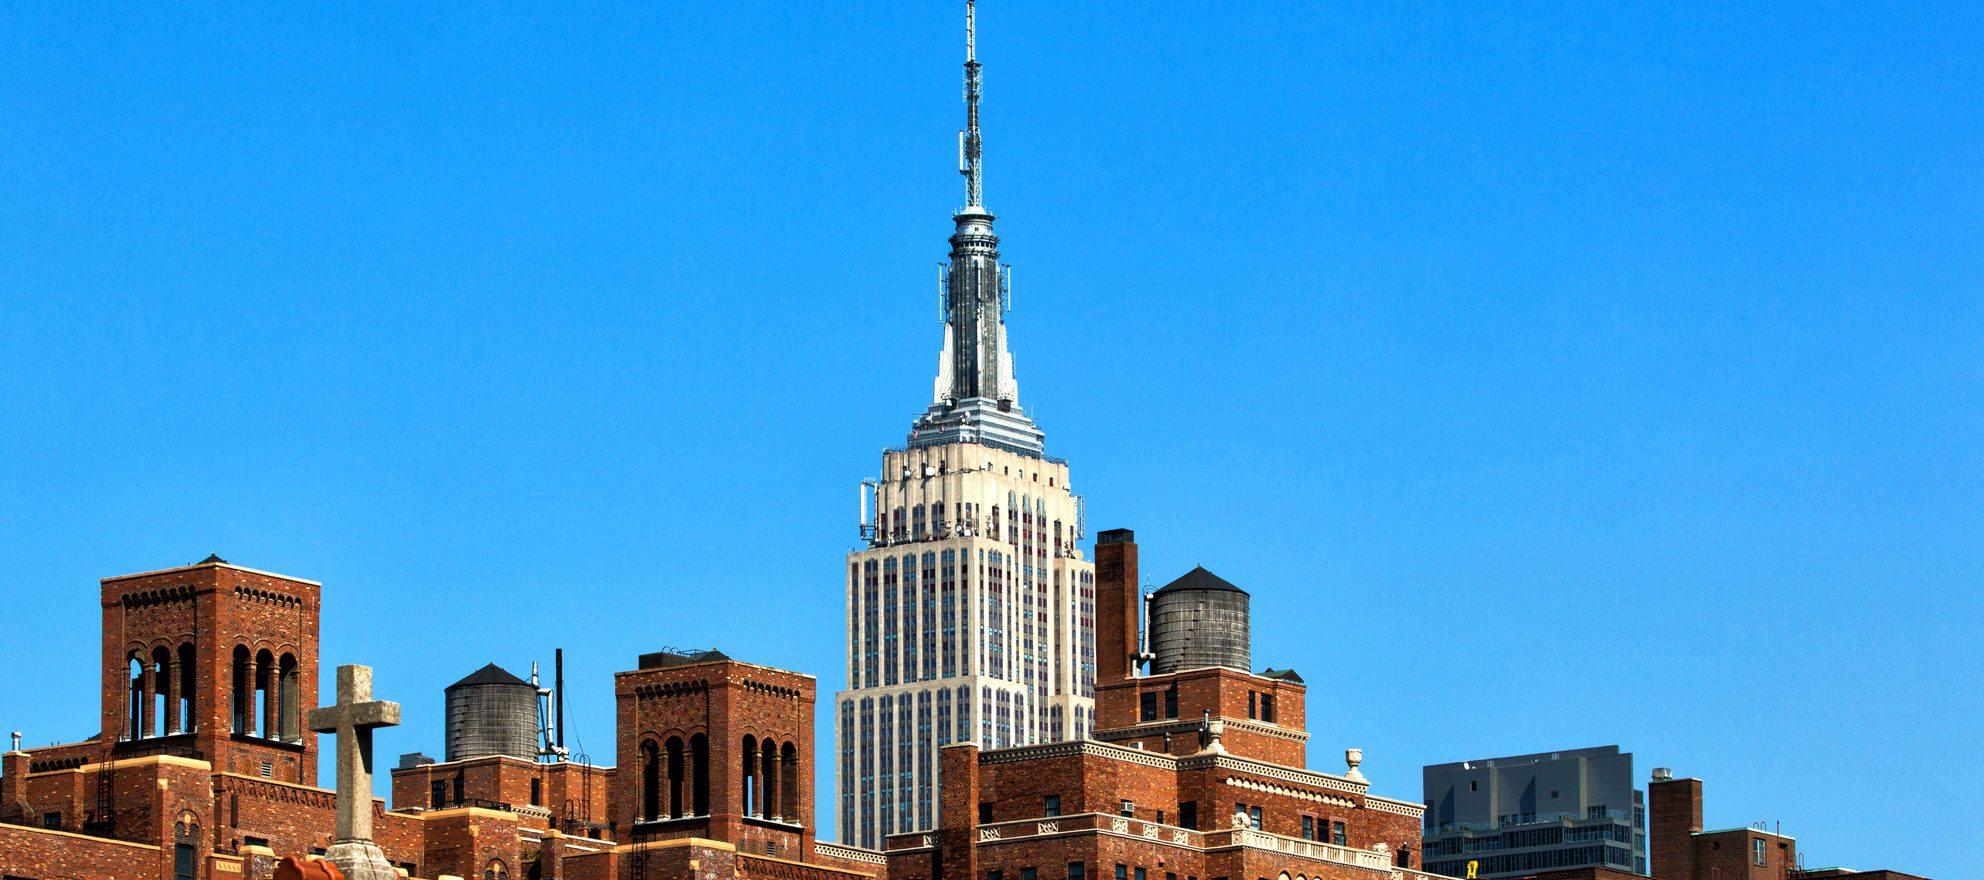 NYC brokerages unite to launch 'game-changing' data platform